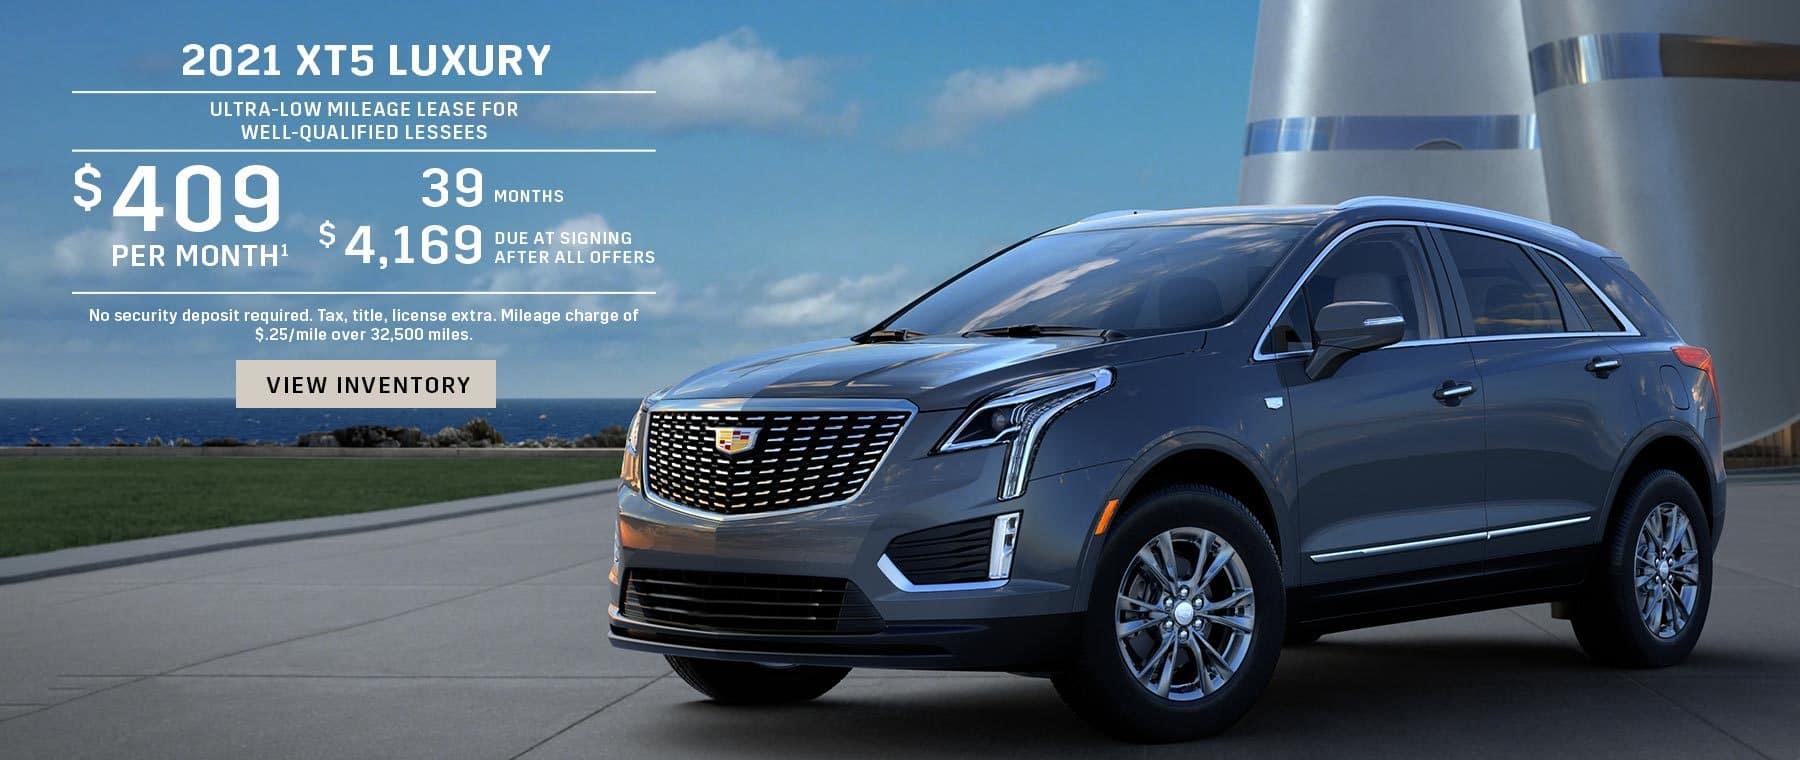 2021 Cadillac XT5 offer